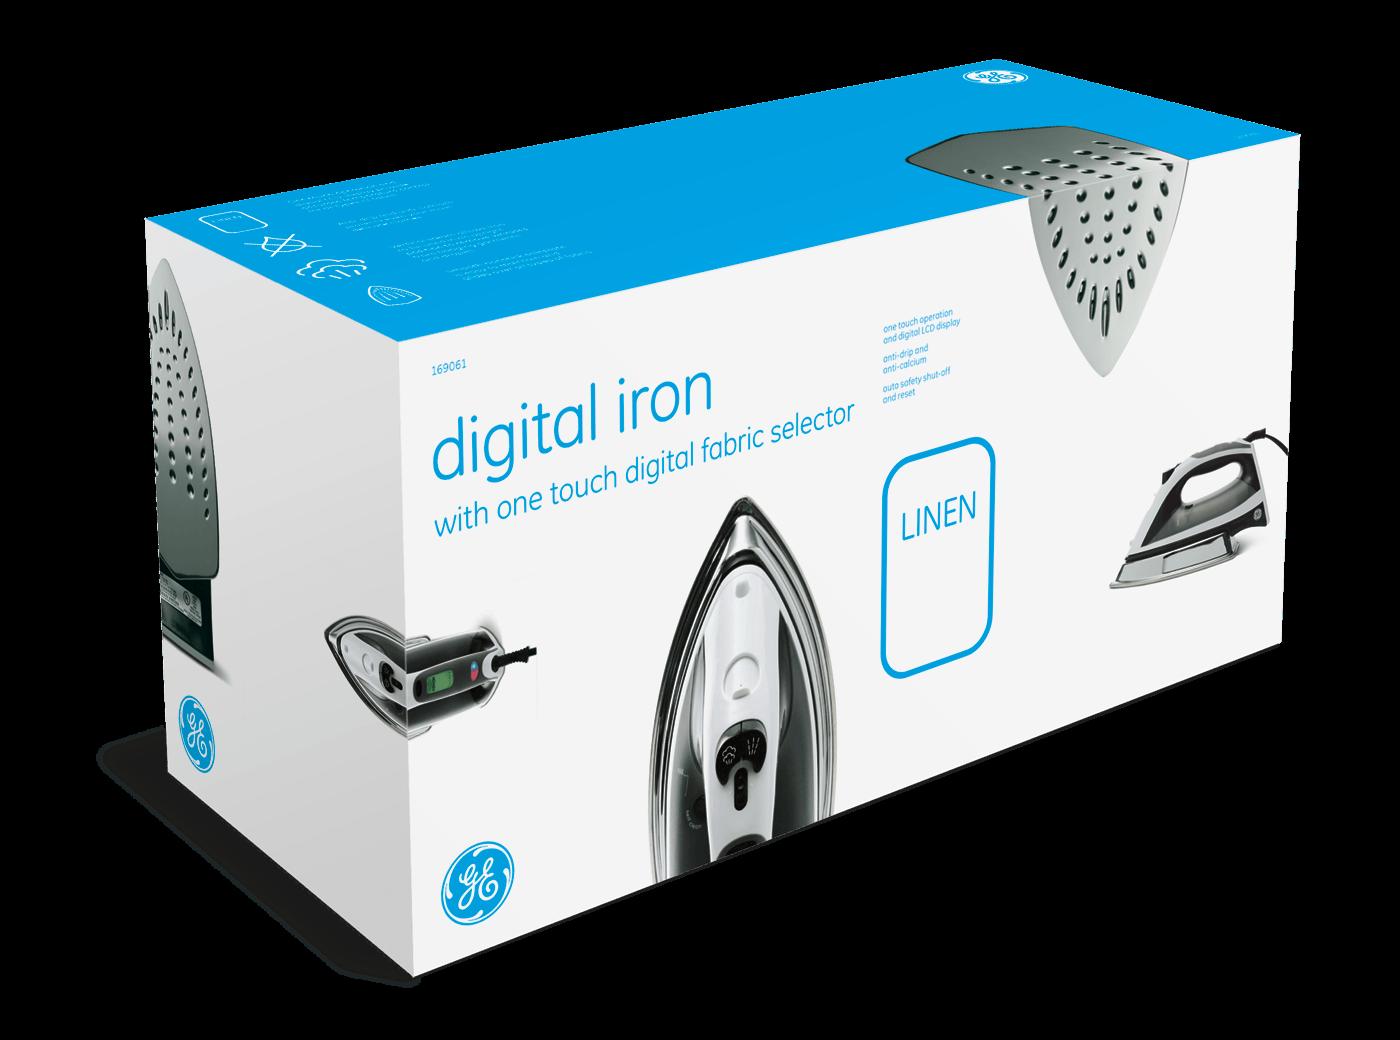 GE0604_digital iron blue